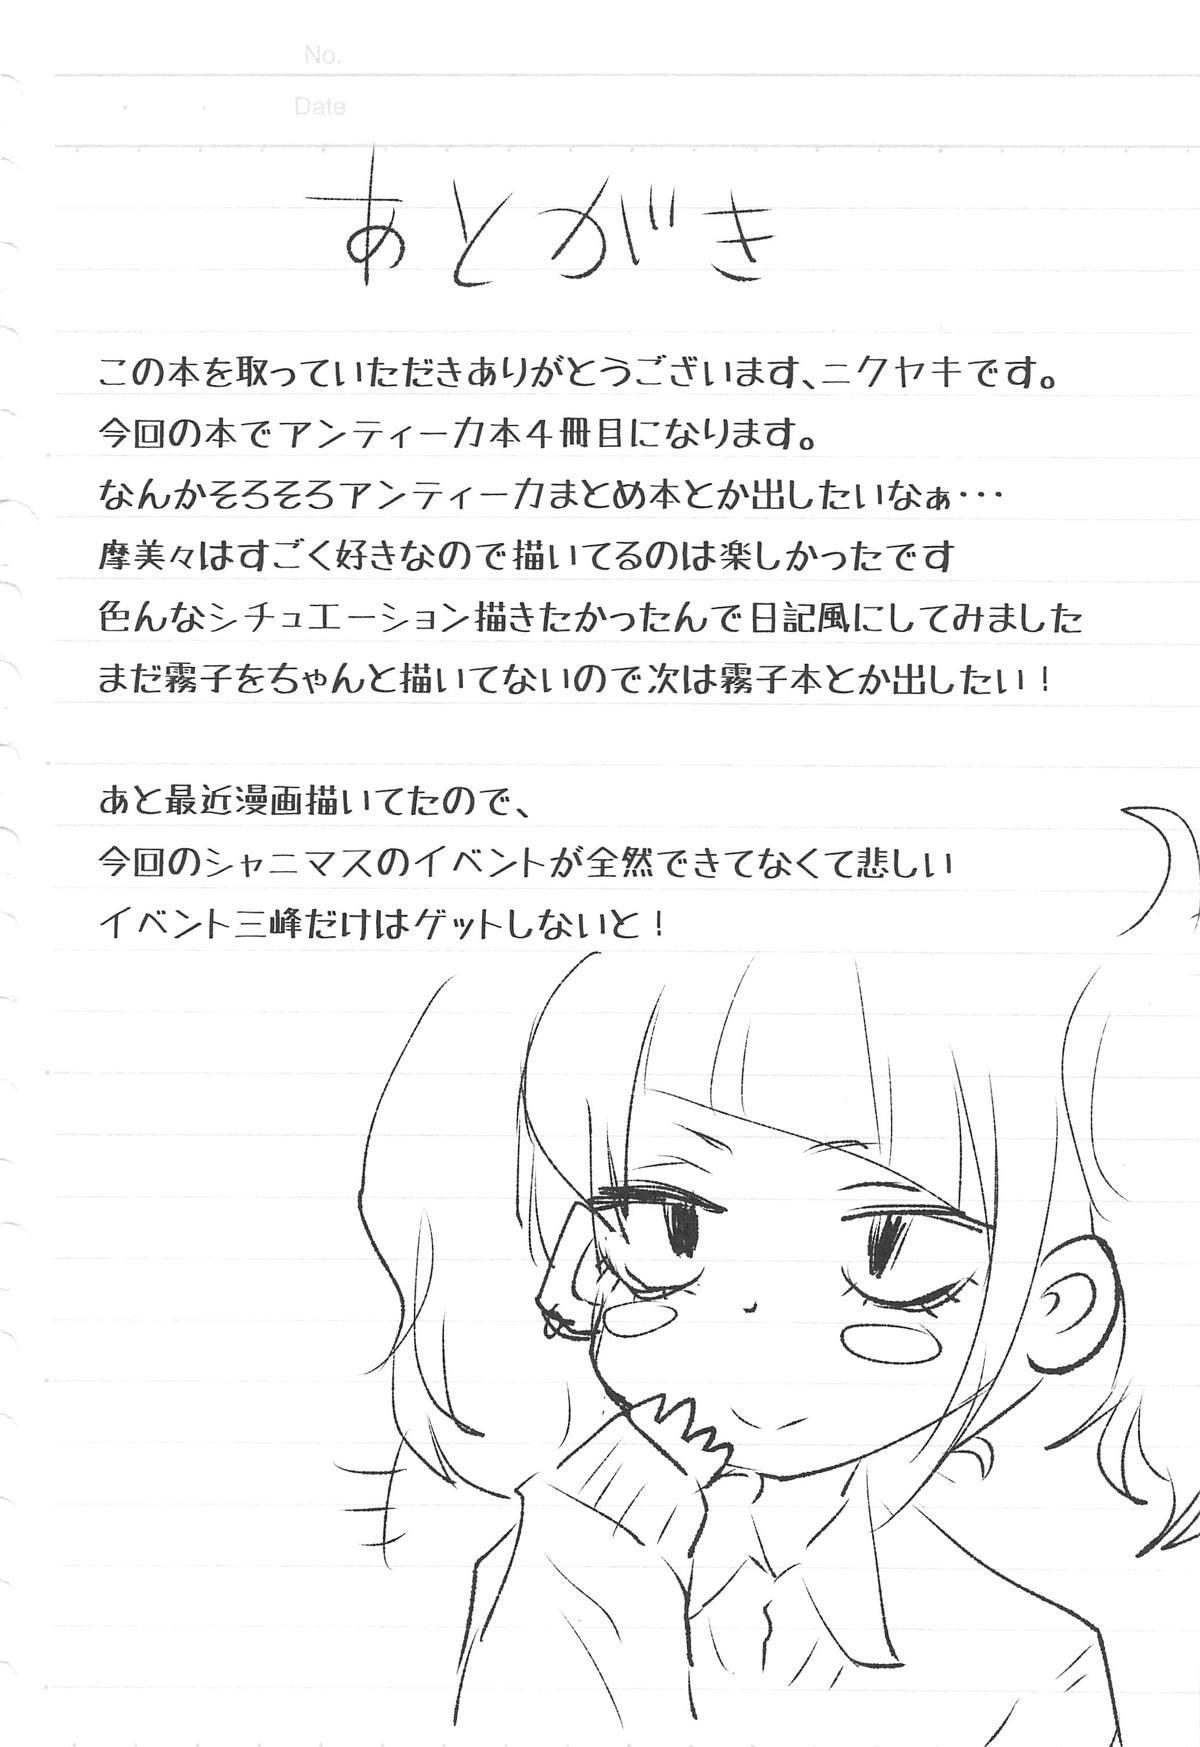 Mamimi no Itazura Nikki 16